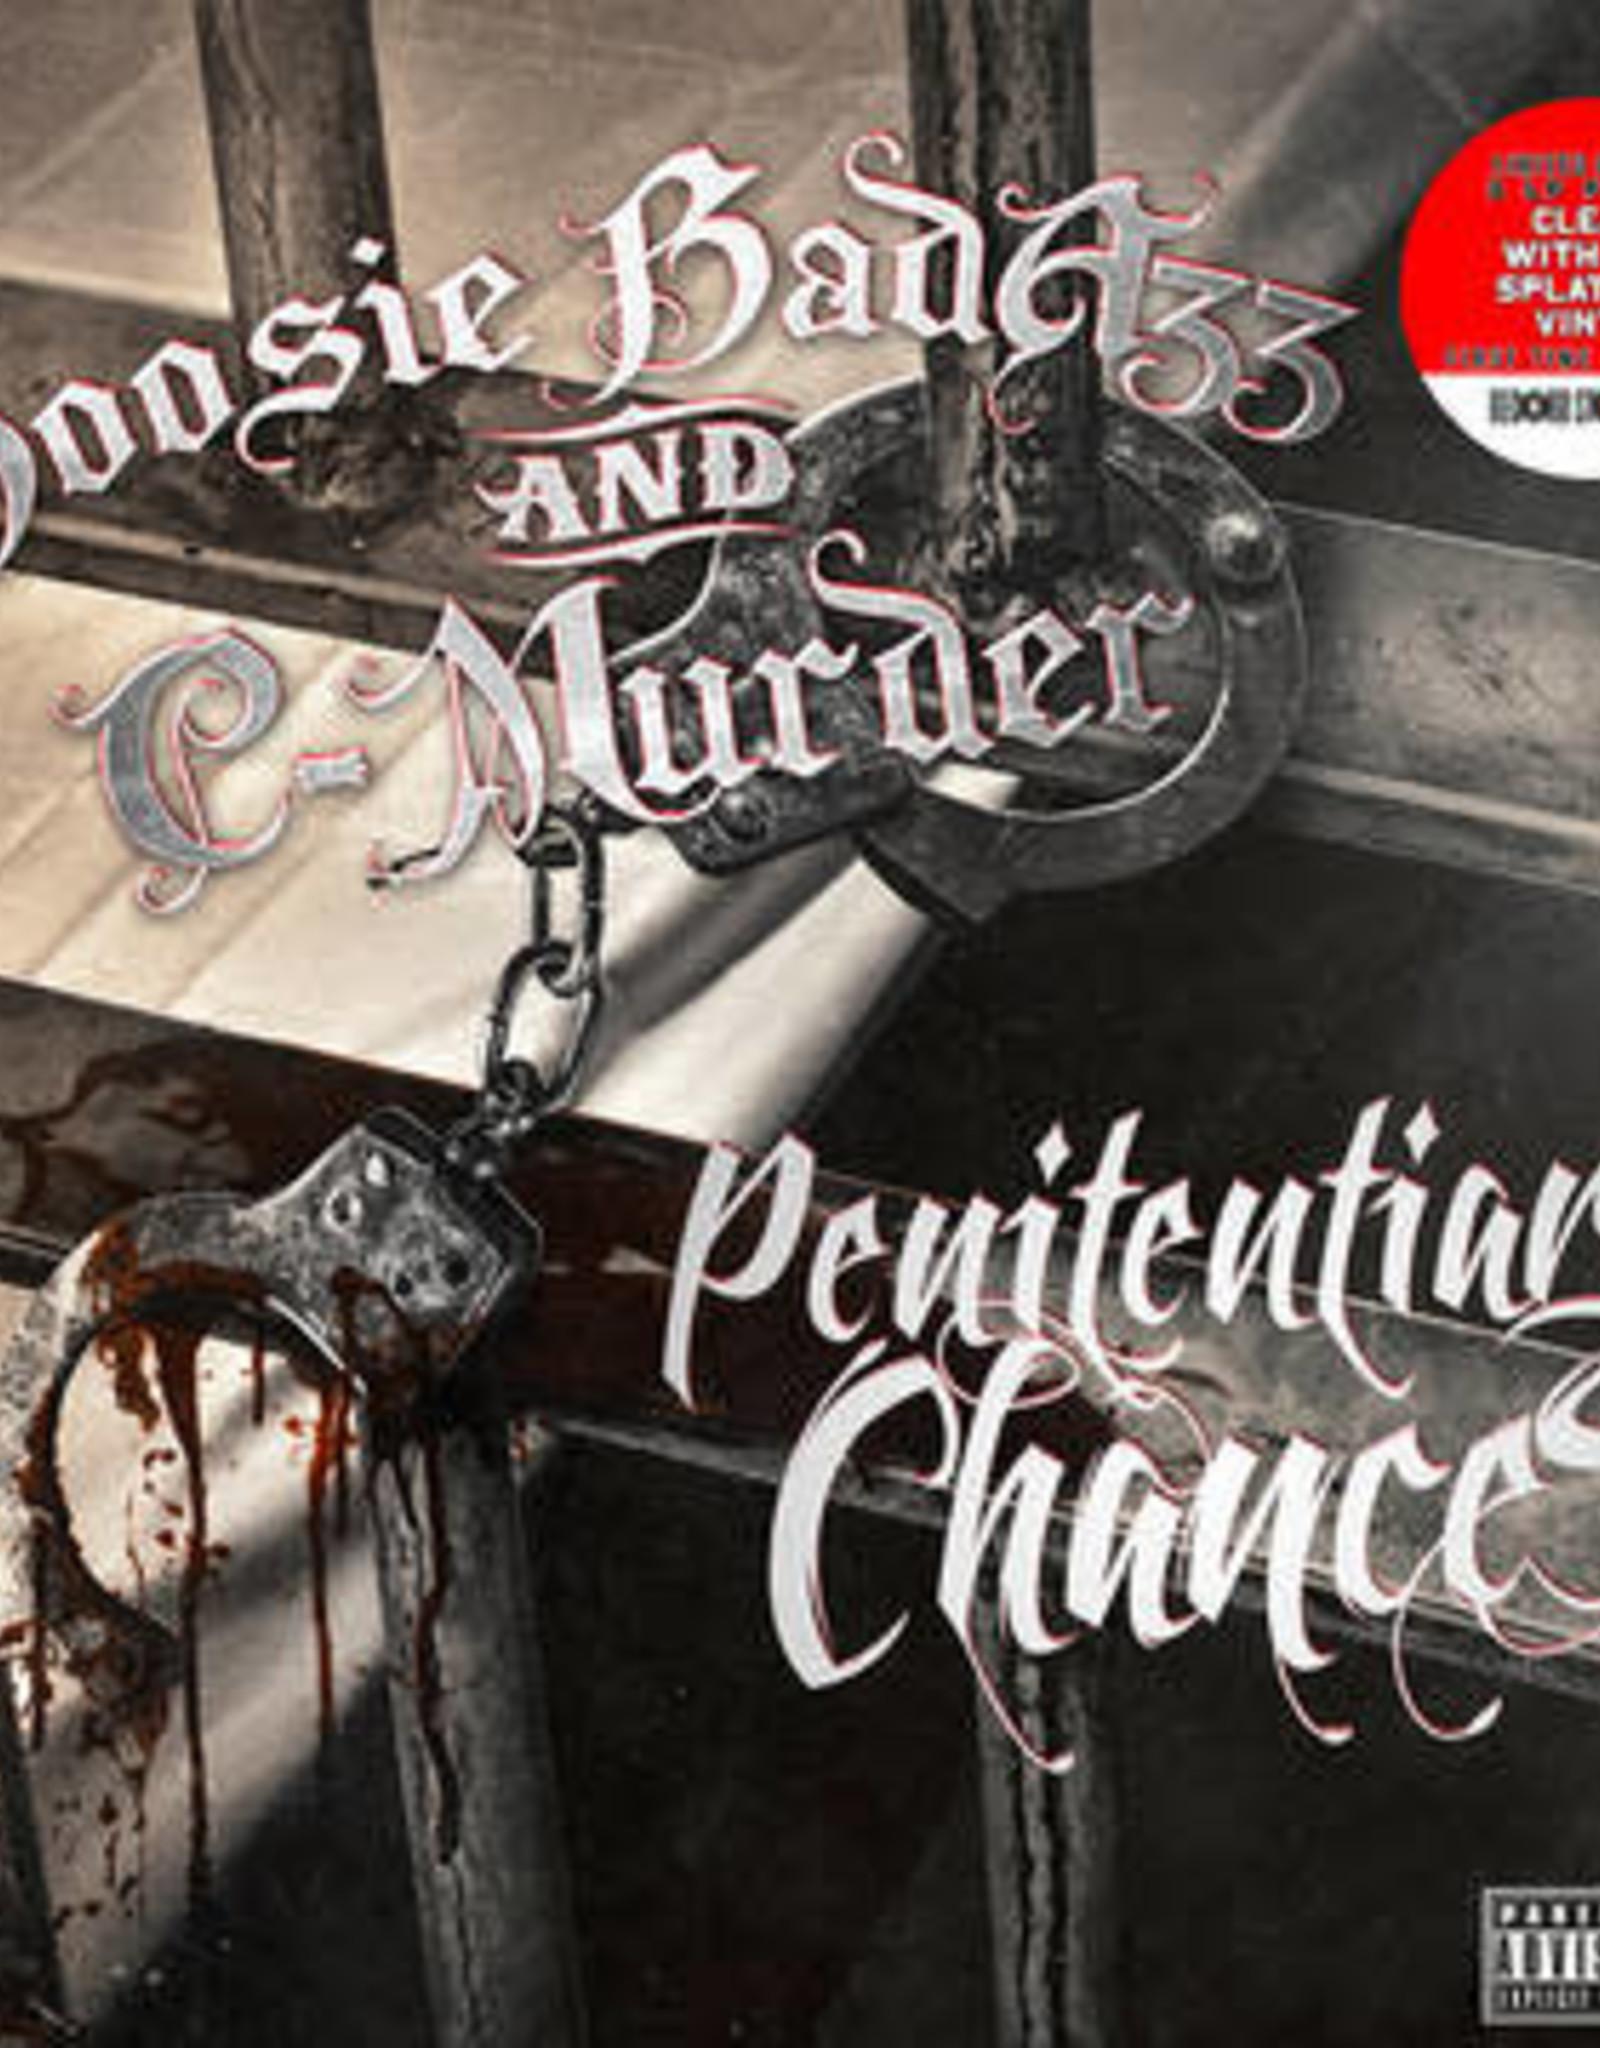 C-Murder / Boosie Badazz-  Penitentiary Chances (RSD 6/21)